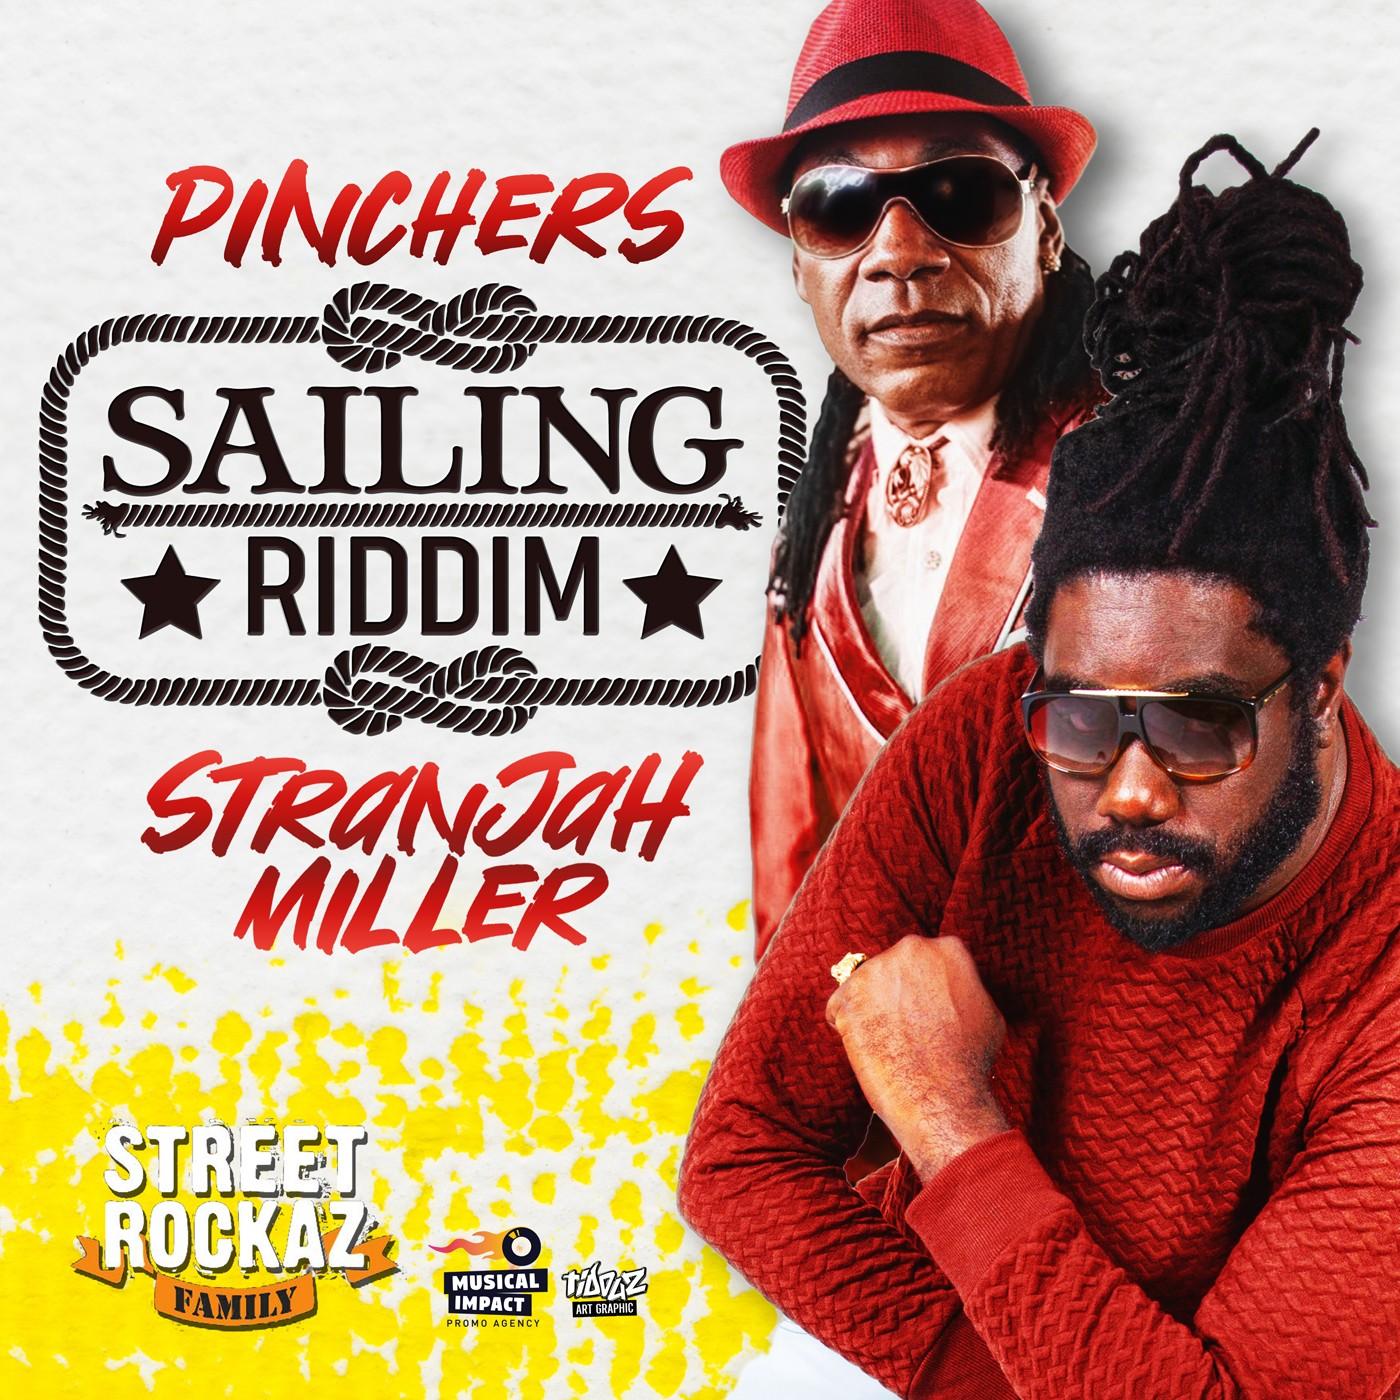 Sailing Riddim feat. Stranjah Miller & Pinchers produit par Street Rockaz Family